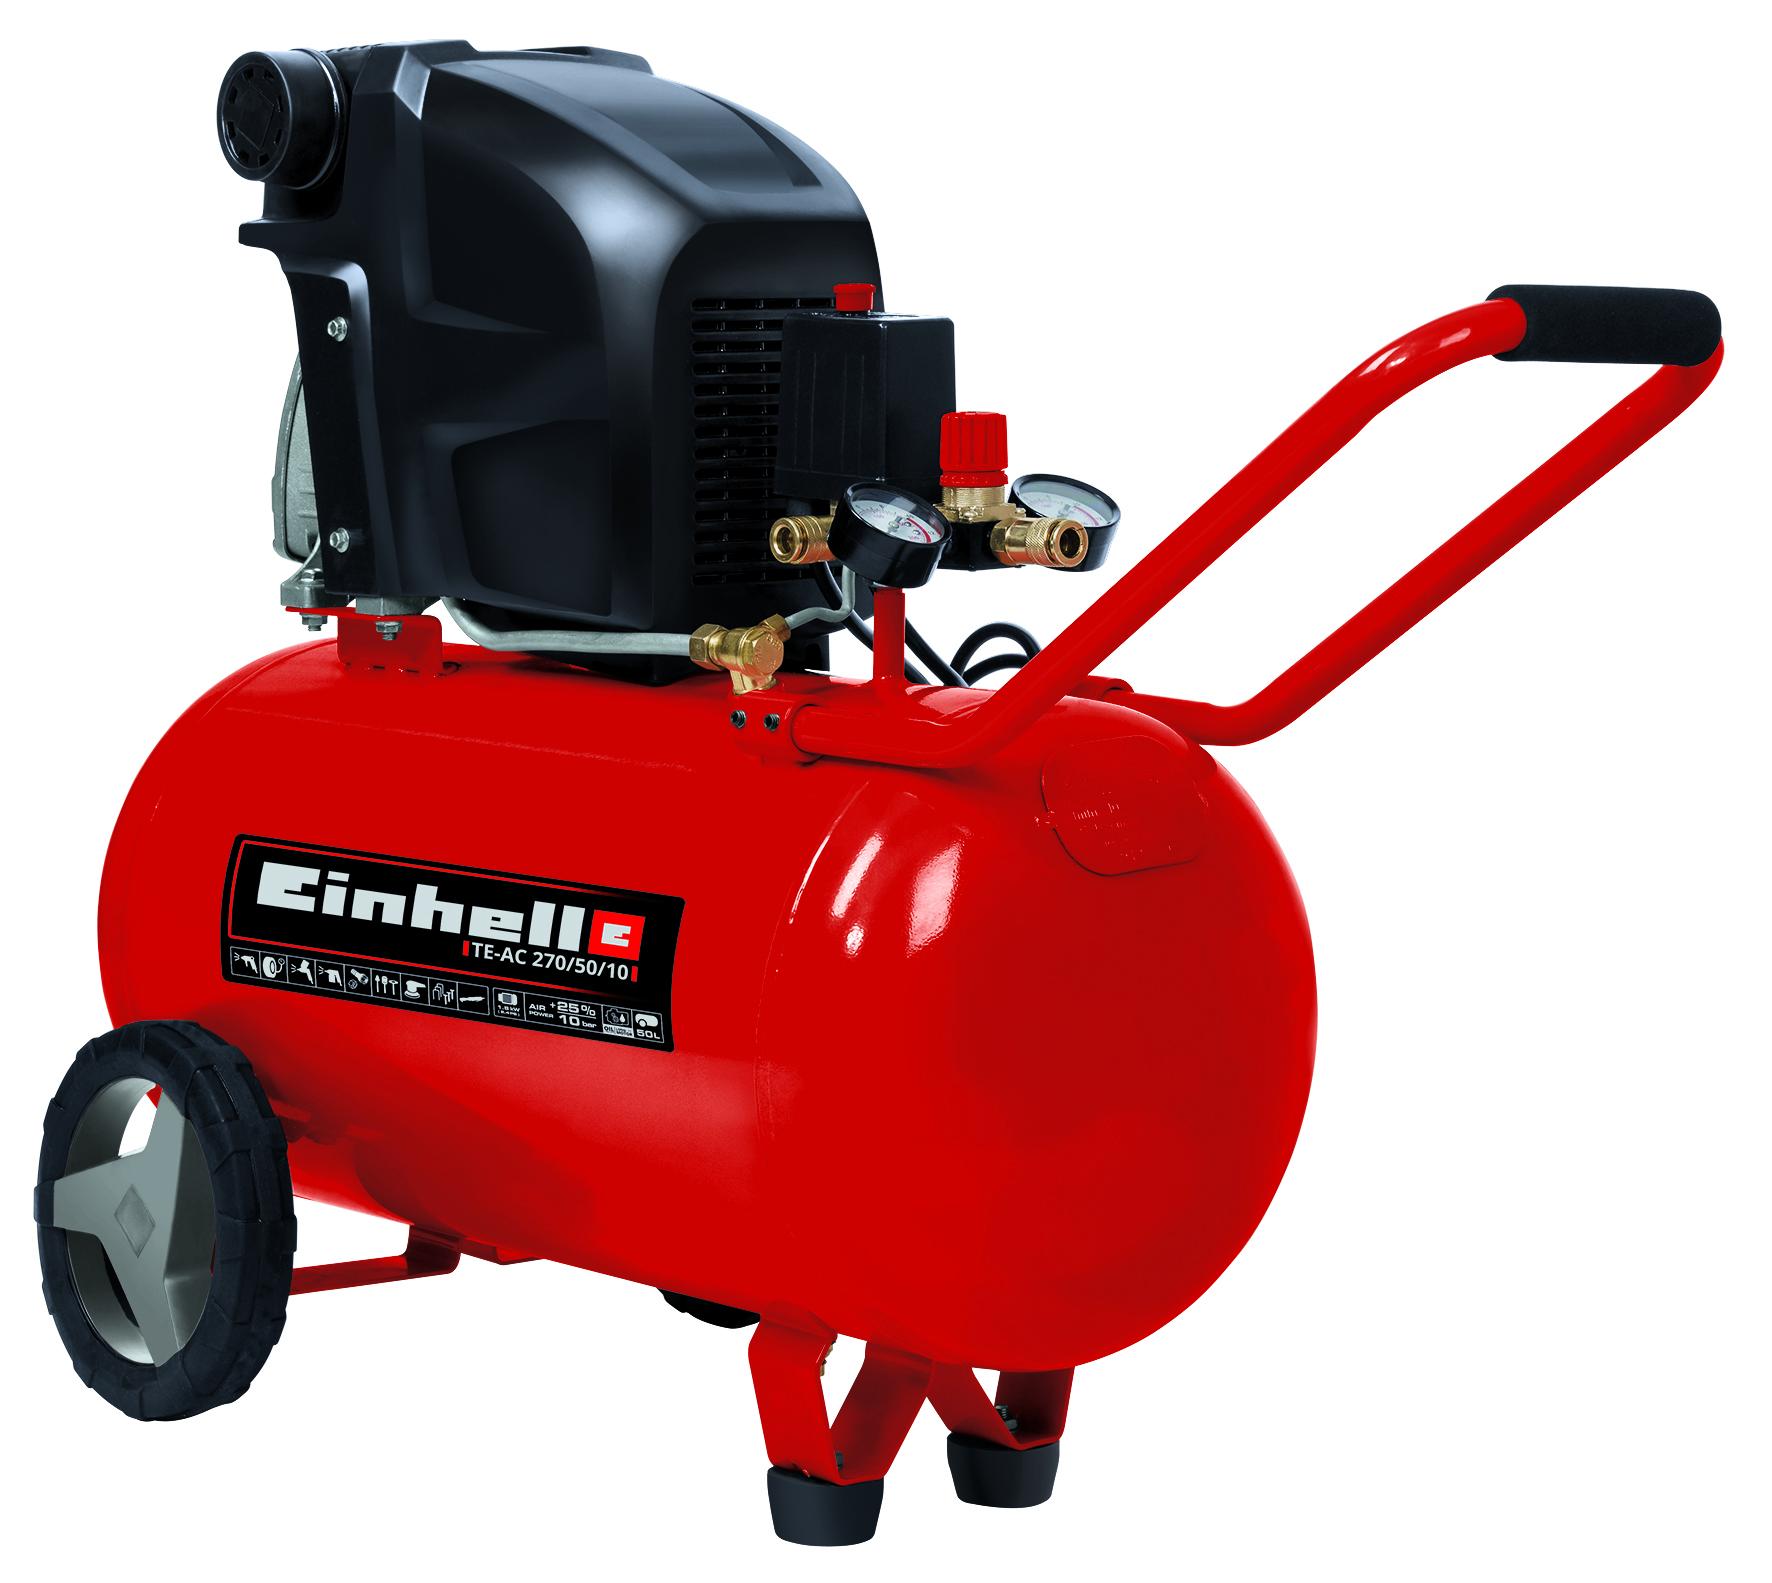 Kompressor - TE-AC 270/50/10